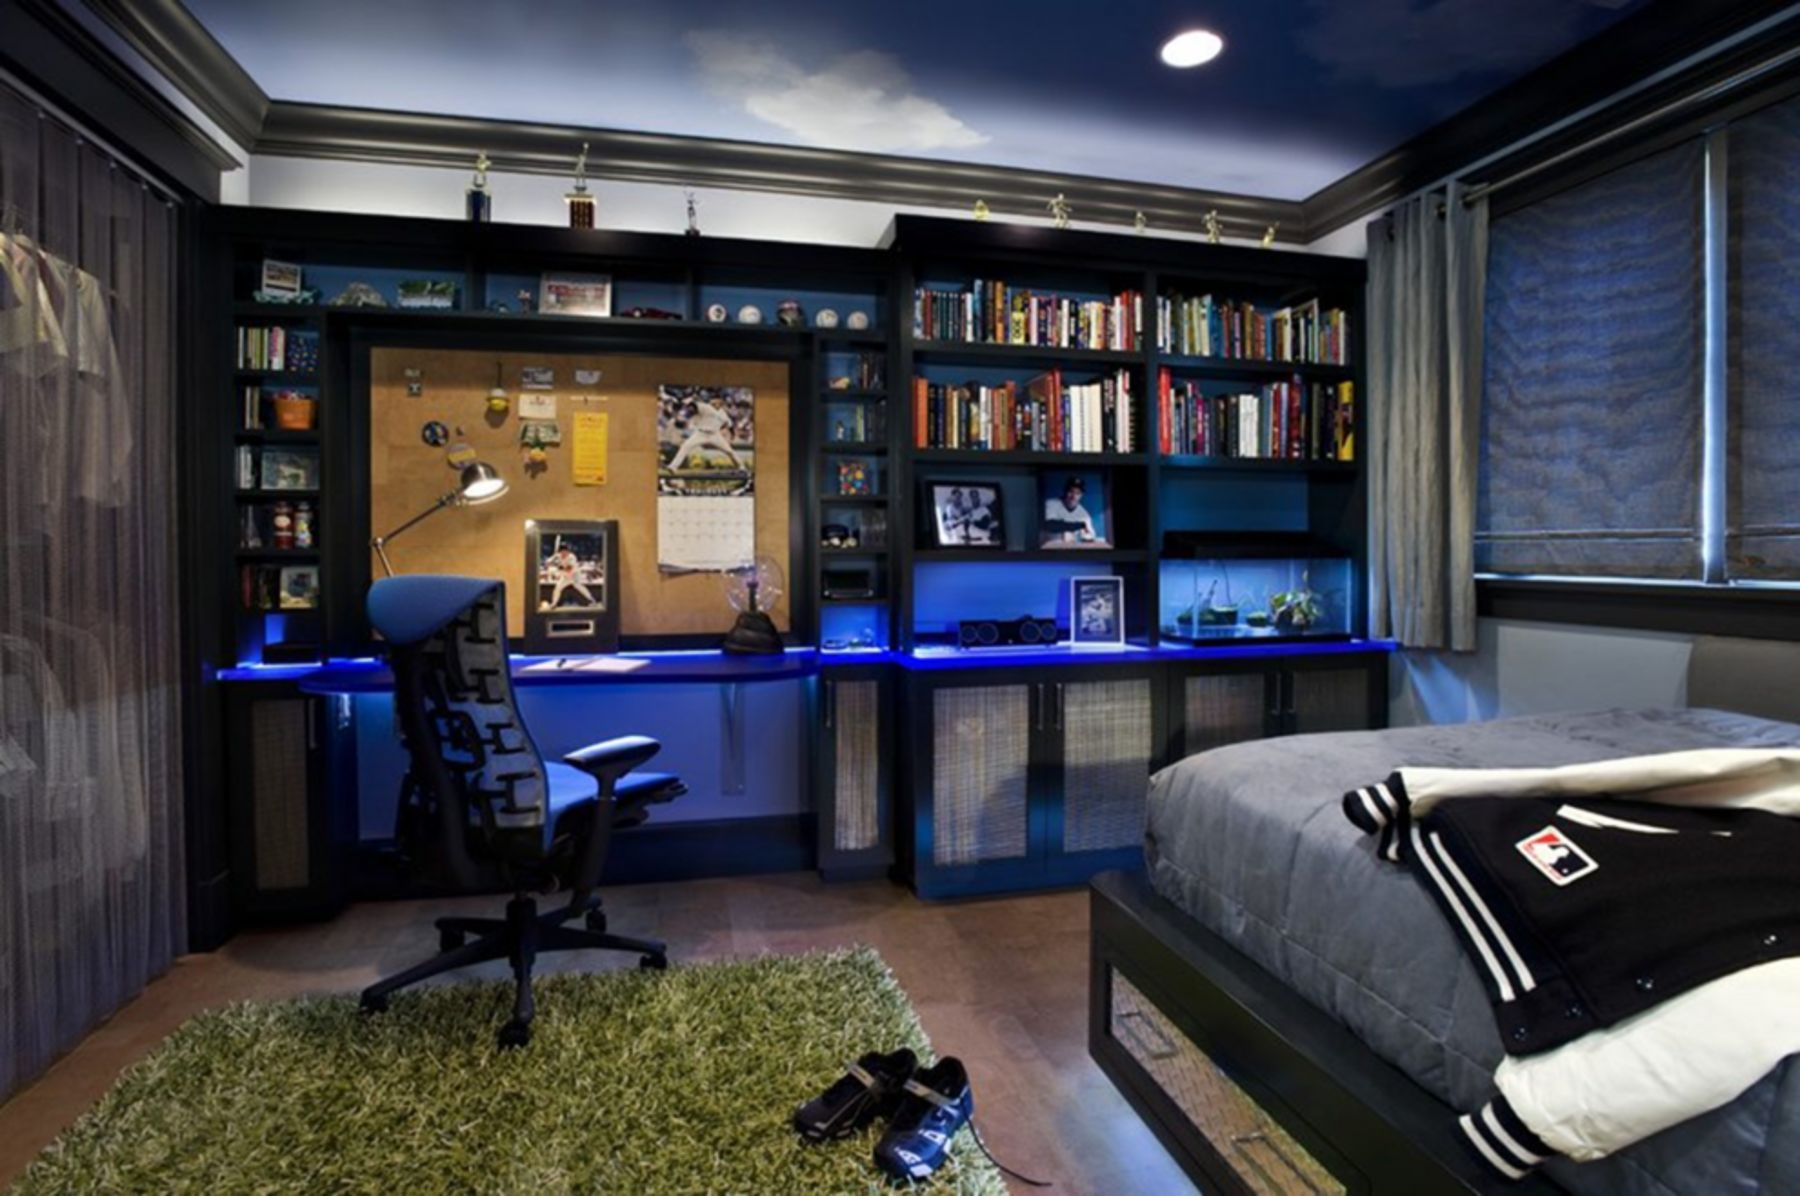 Porter Dining Room Set, 10 Elegant Teenage Boy Bedroom Design And Decor Ideas For Your Teenage Boy Bedroom Design Cool Boys Room Awesome Bedrooms